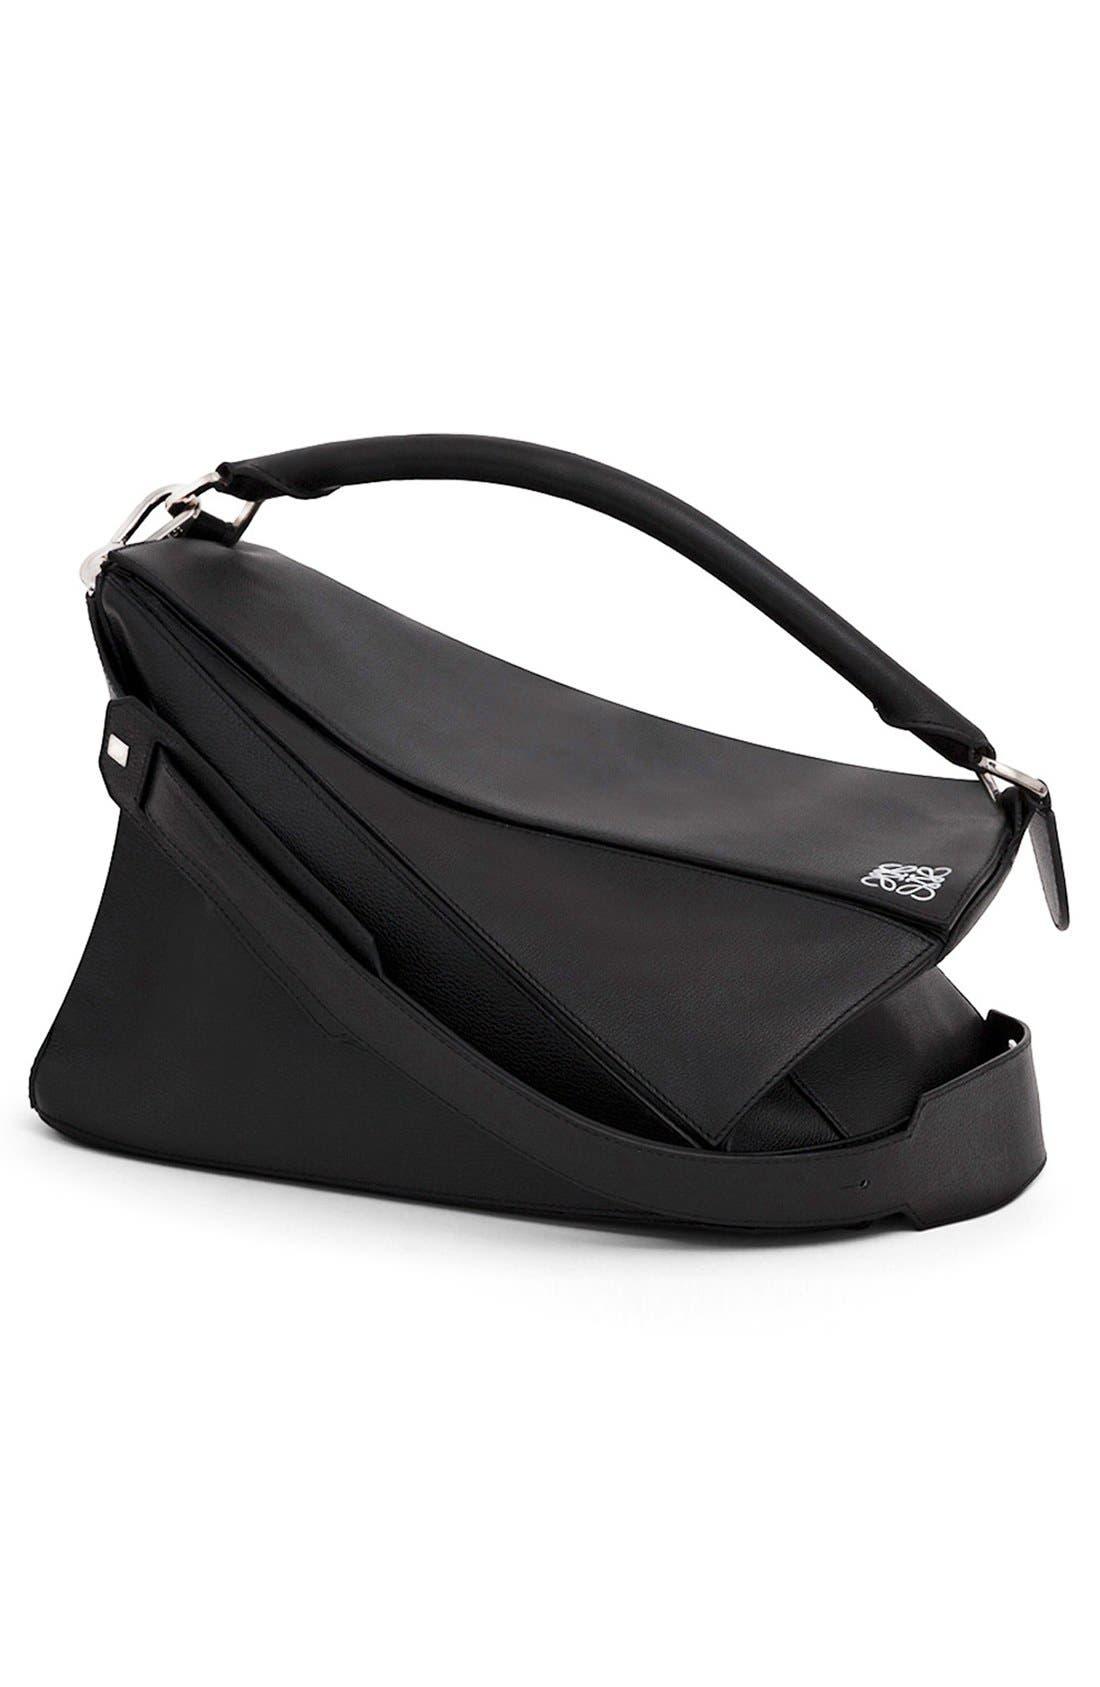 'Large Puzzle' Calfskin Leather Bag,                             Alternate thumbnail 5, color,                             001